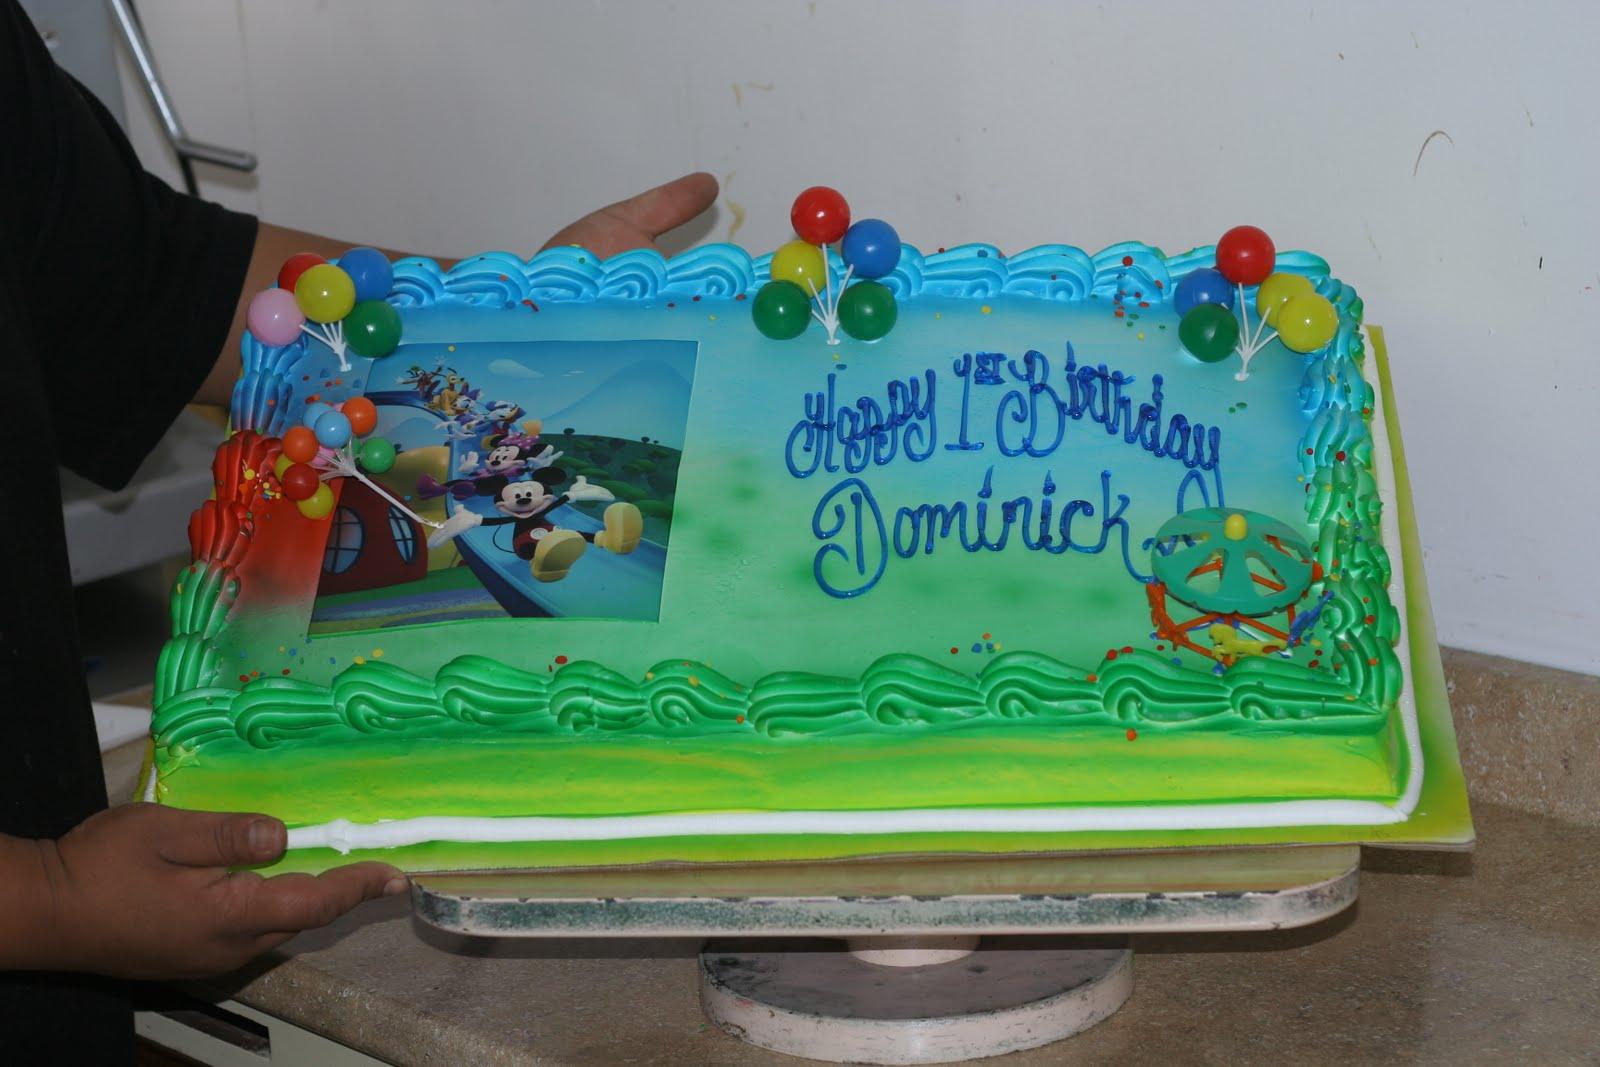 Hectors Custom Cakes July 2010